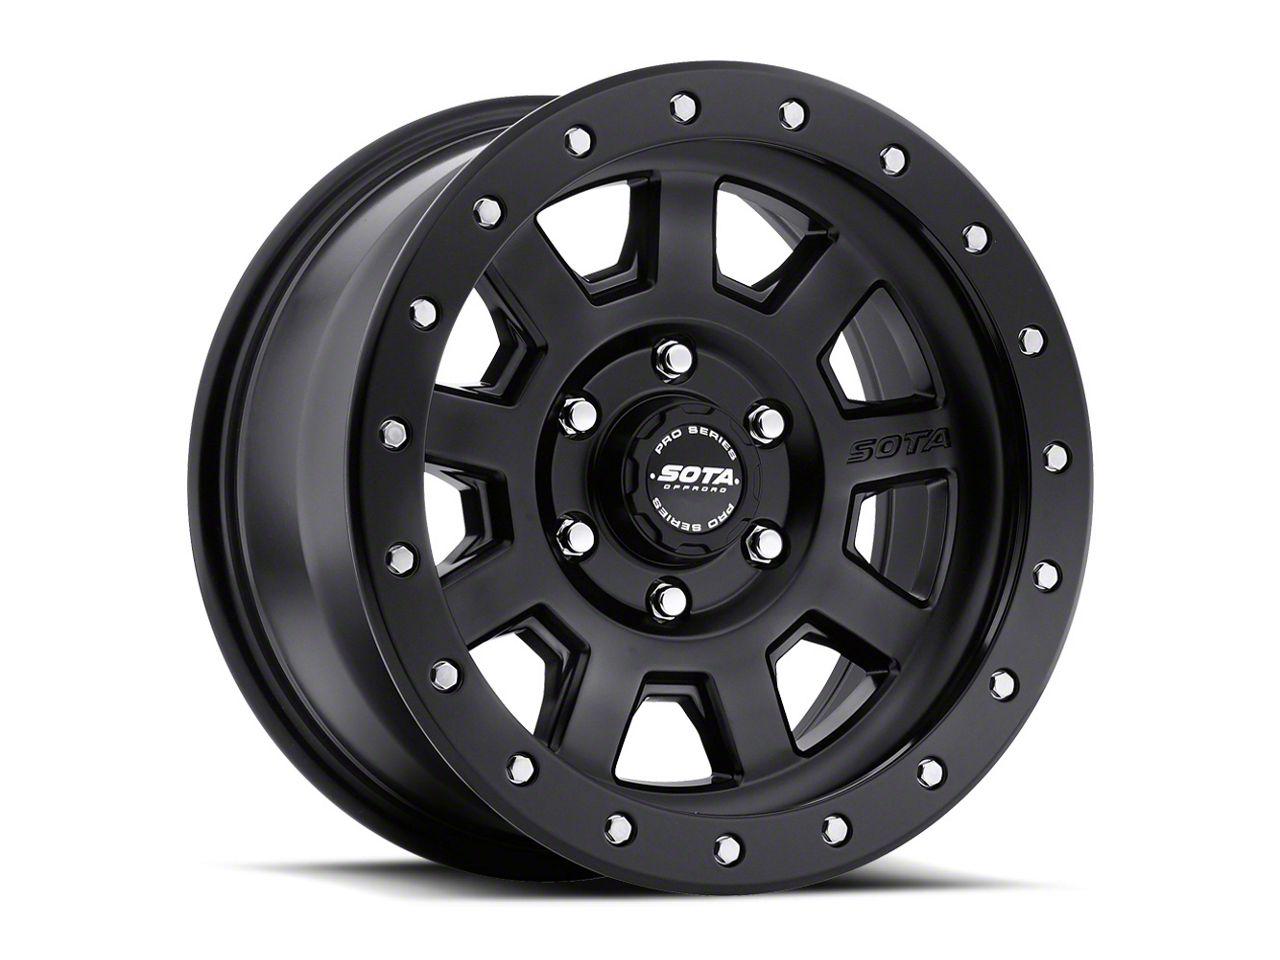 SOTA Off Road S.S.D. Stealth Black 6-Lug Wheel - 17x8.5 (99-18 Silverado 1500)